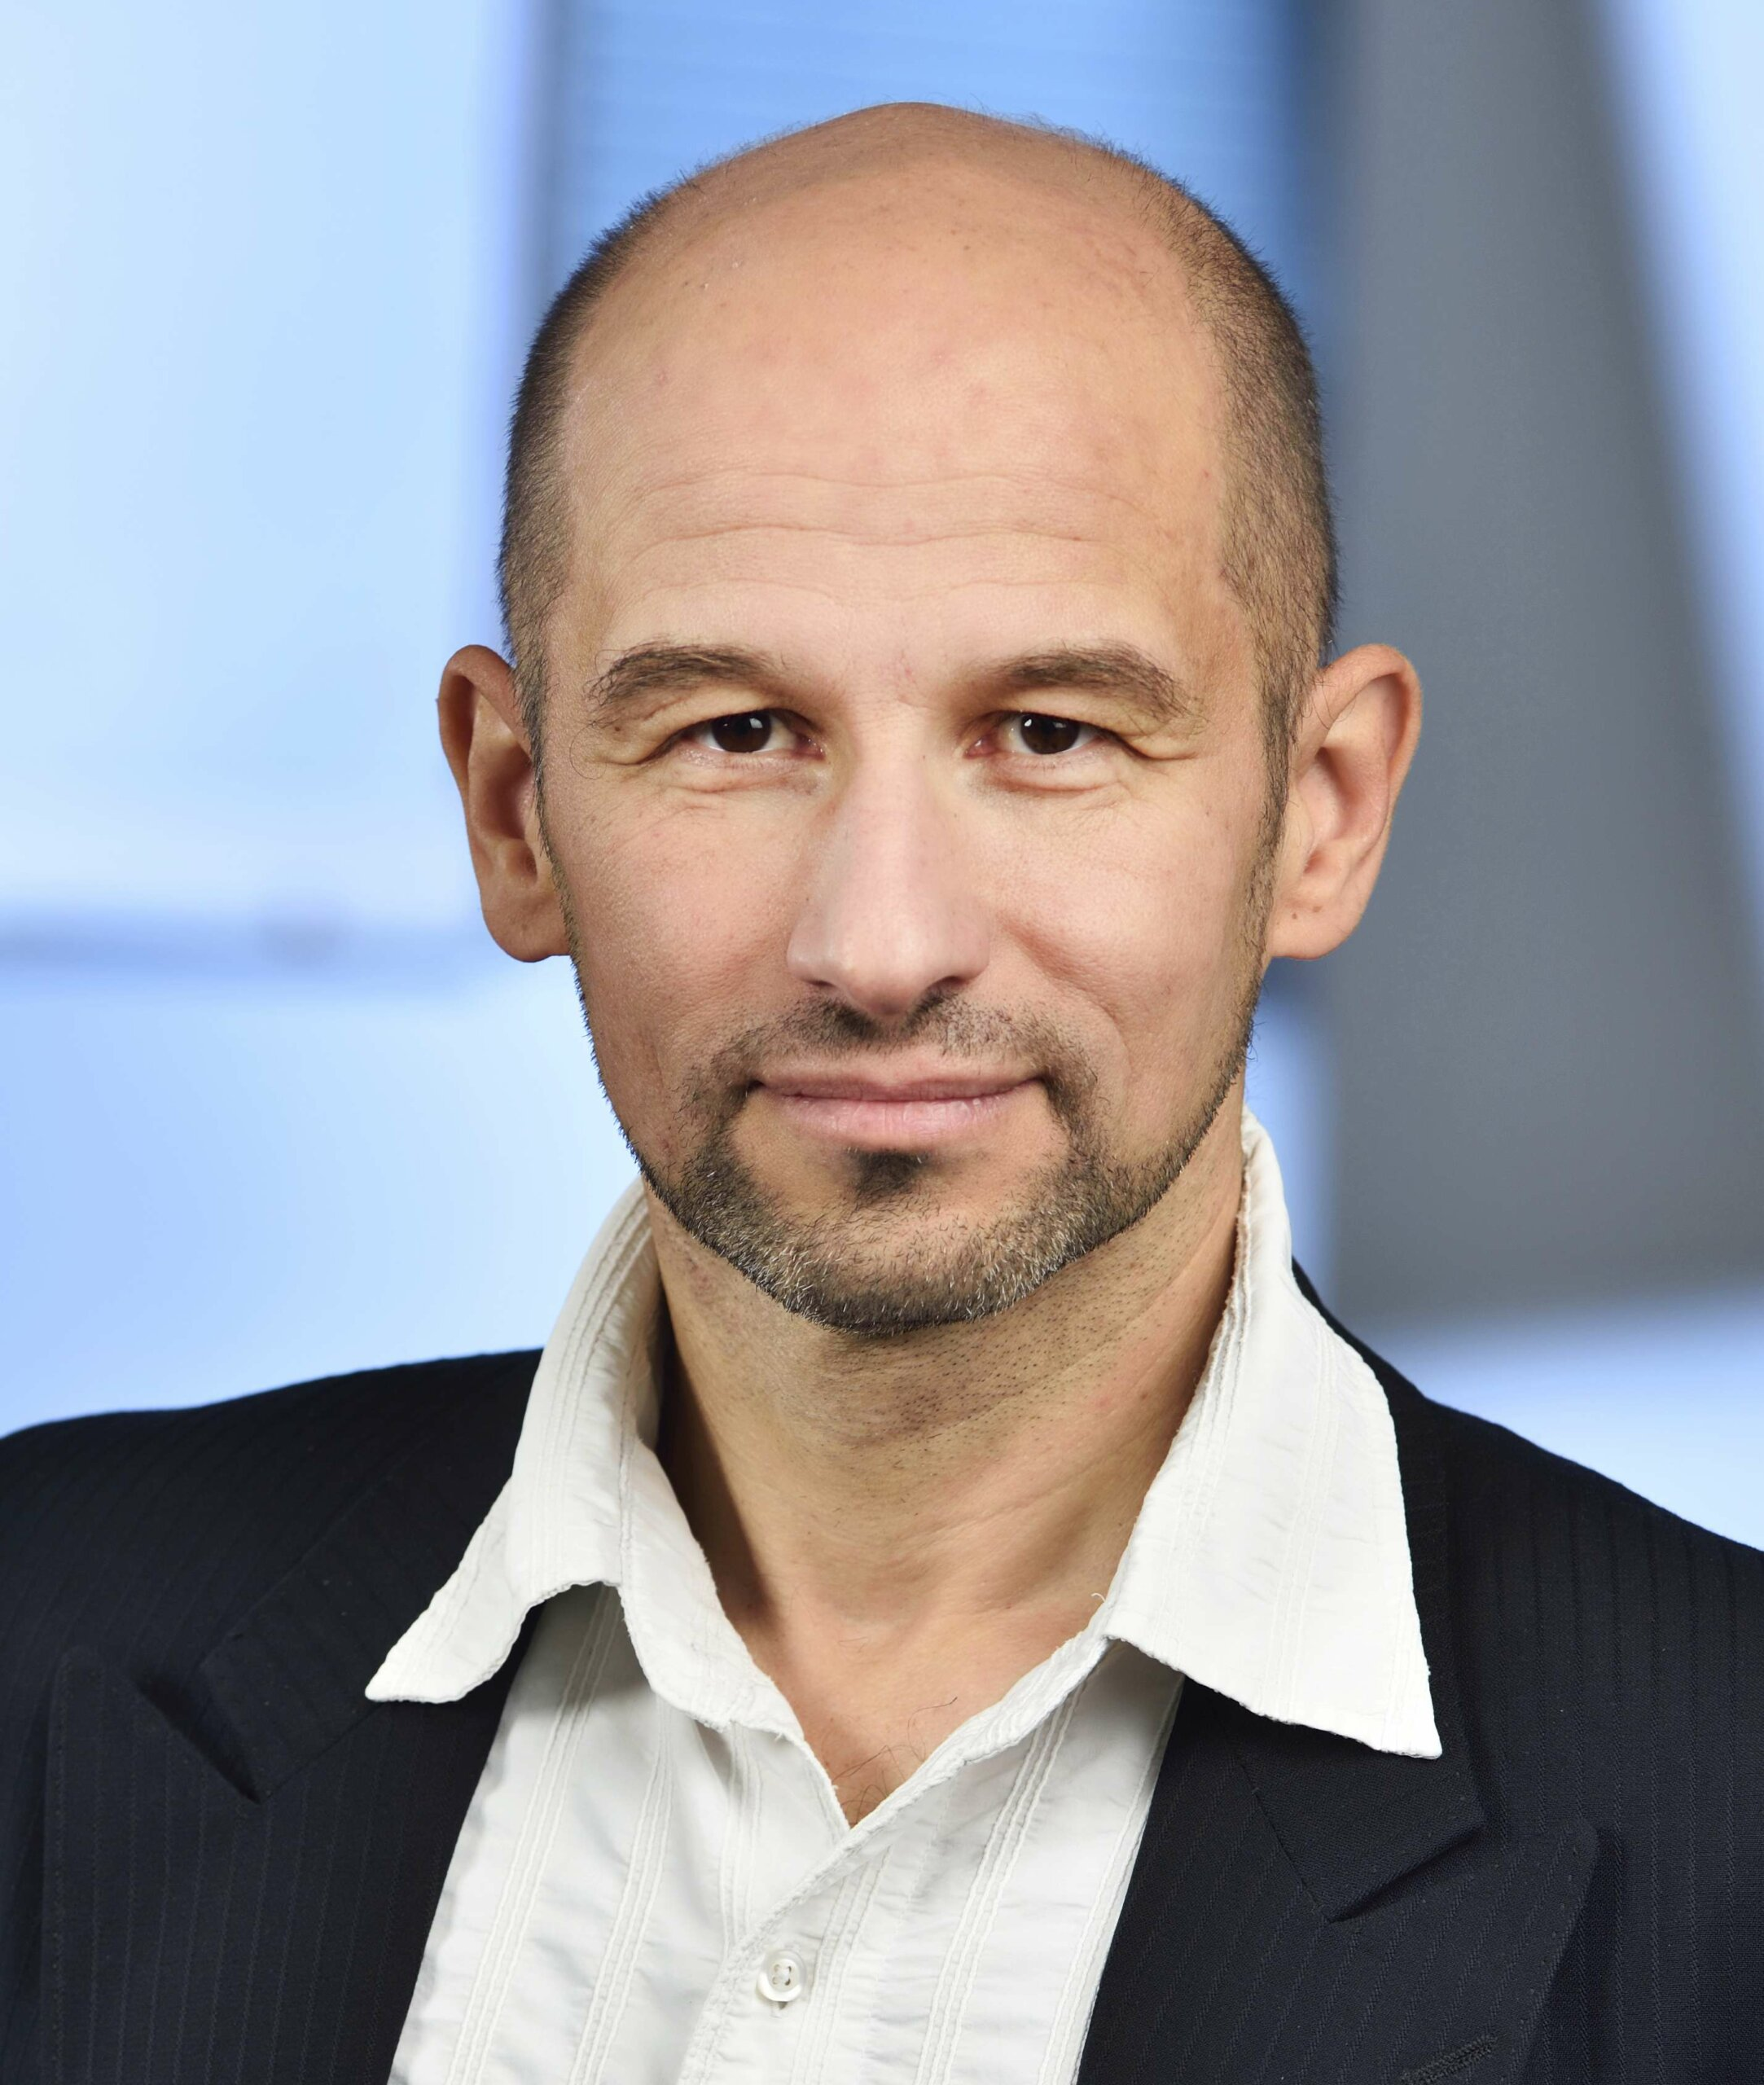 Ernst Gebetsroither Profilbild